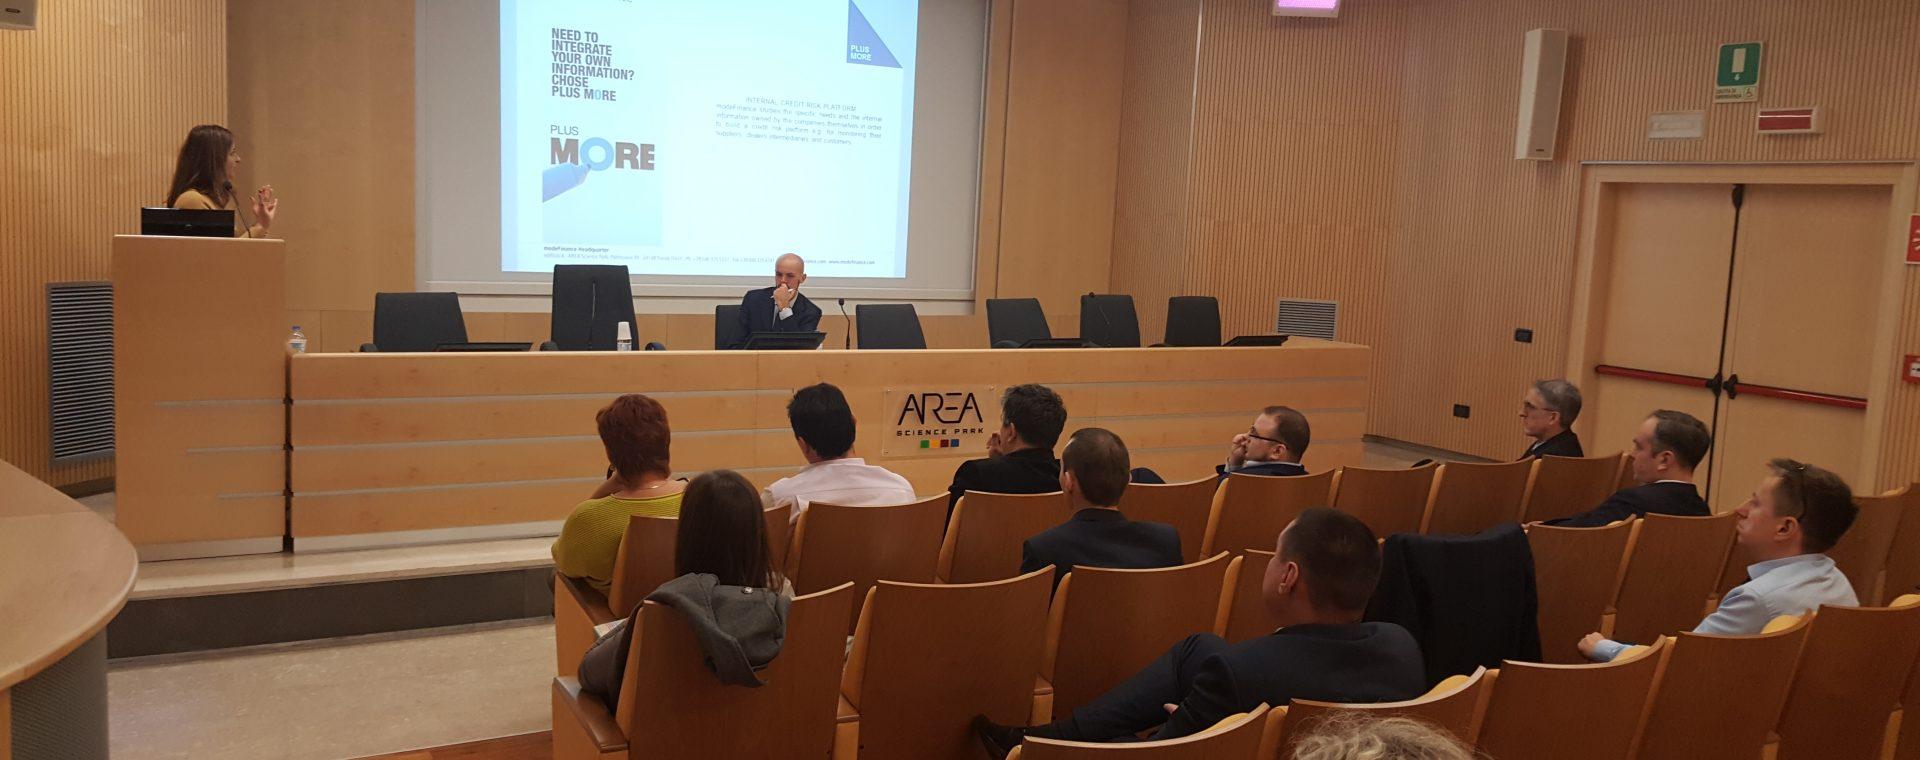 Imprenditori russi in visita in AREA